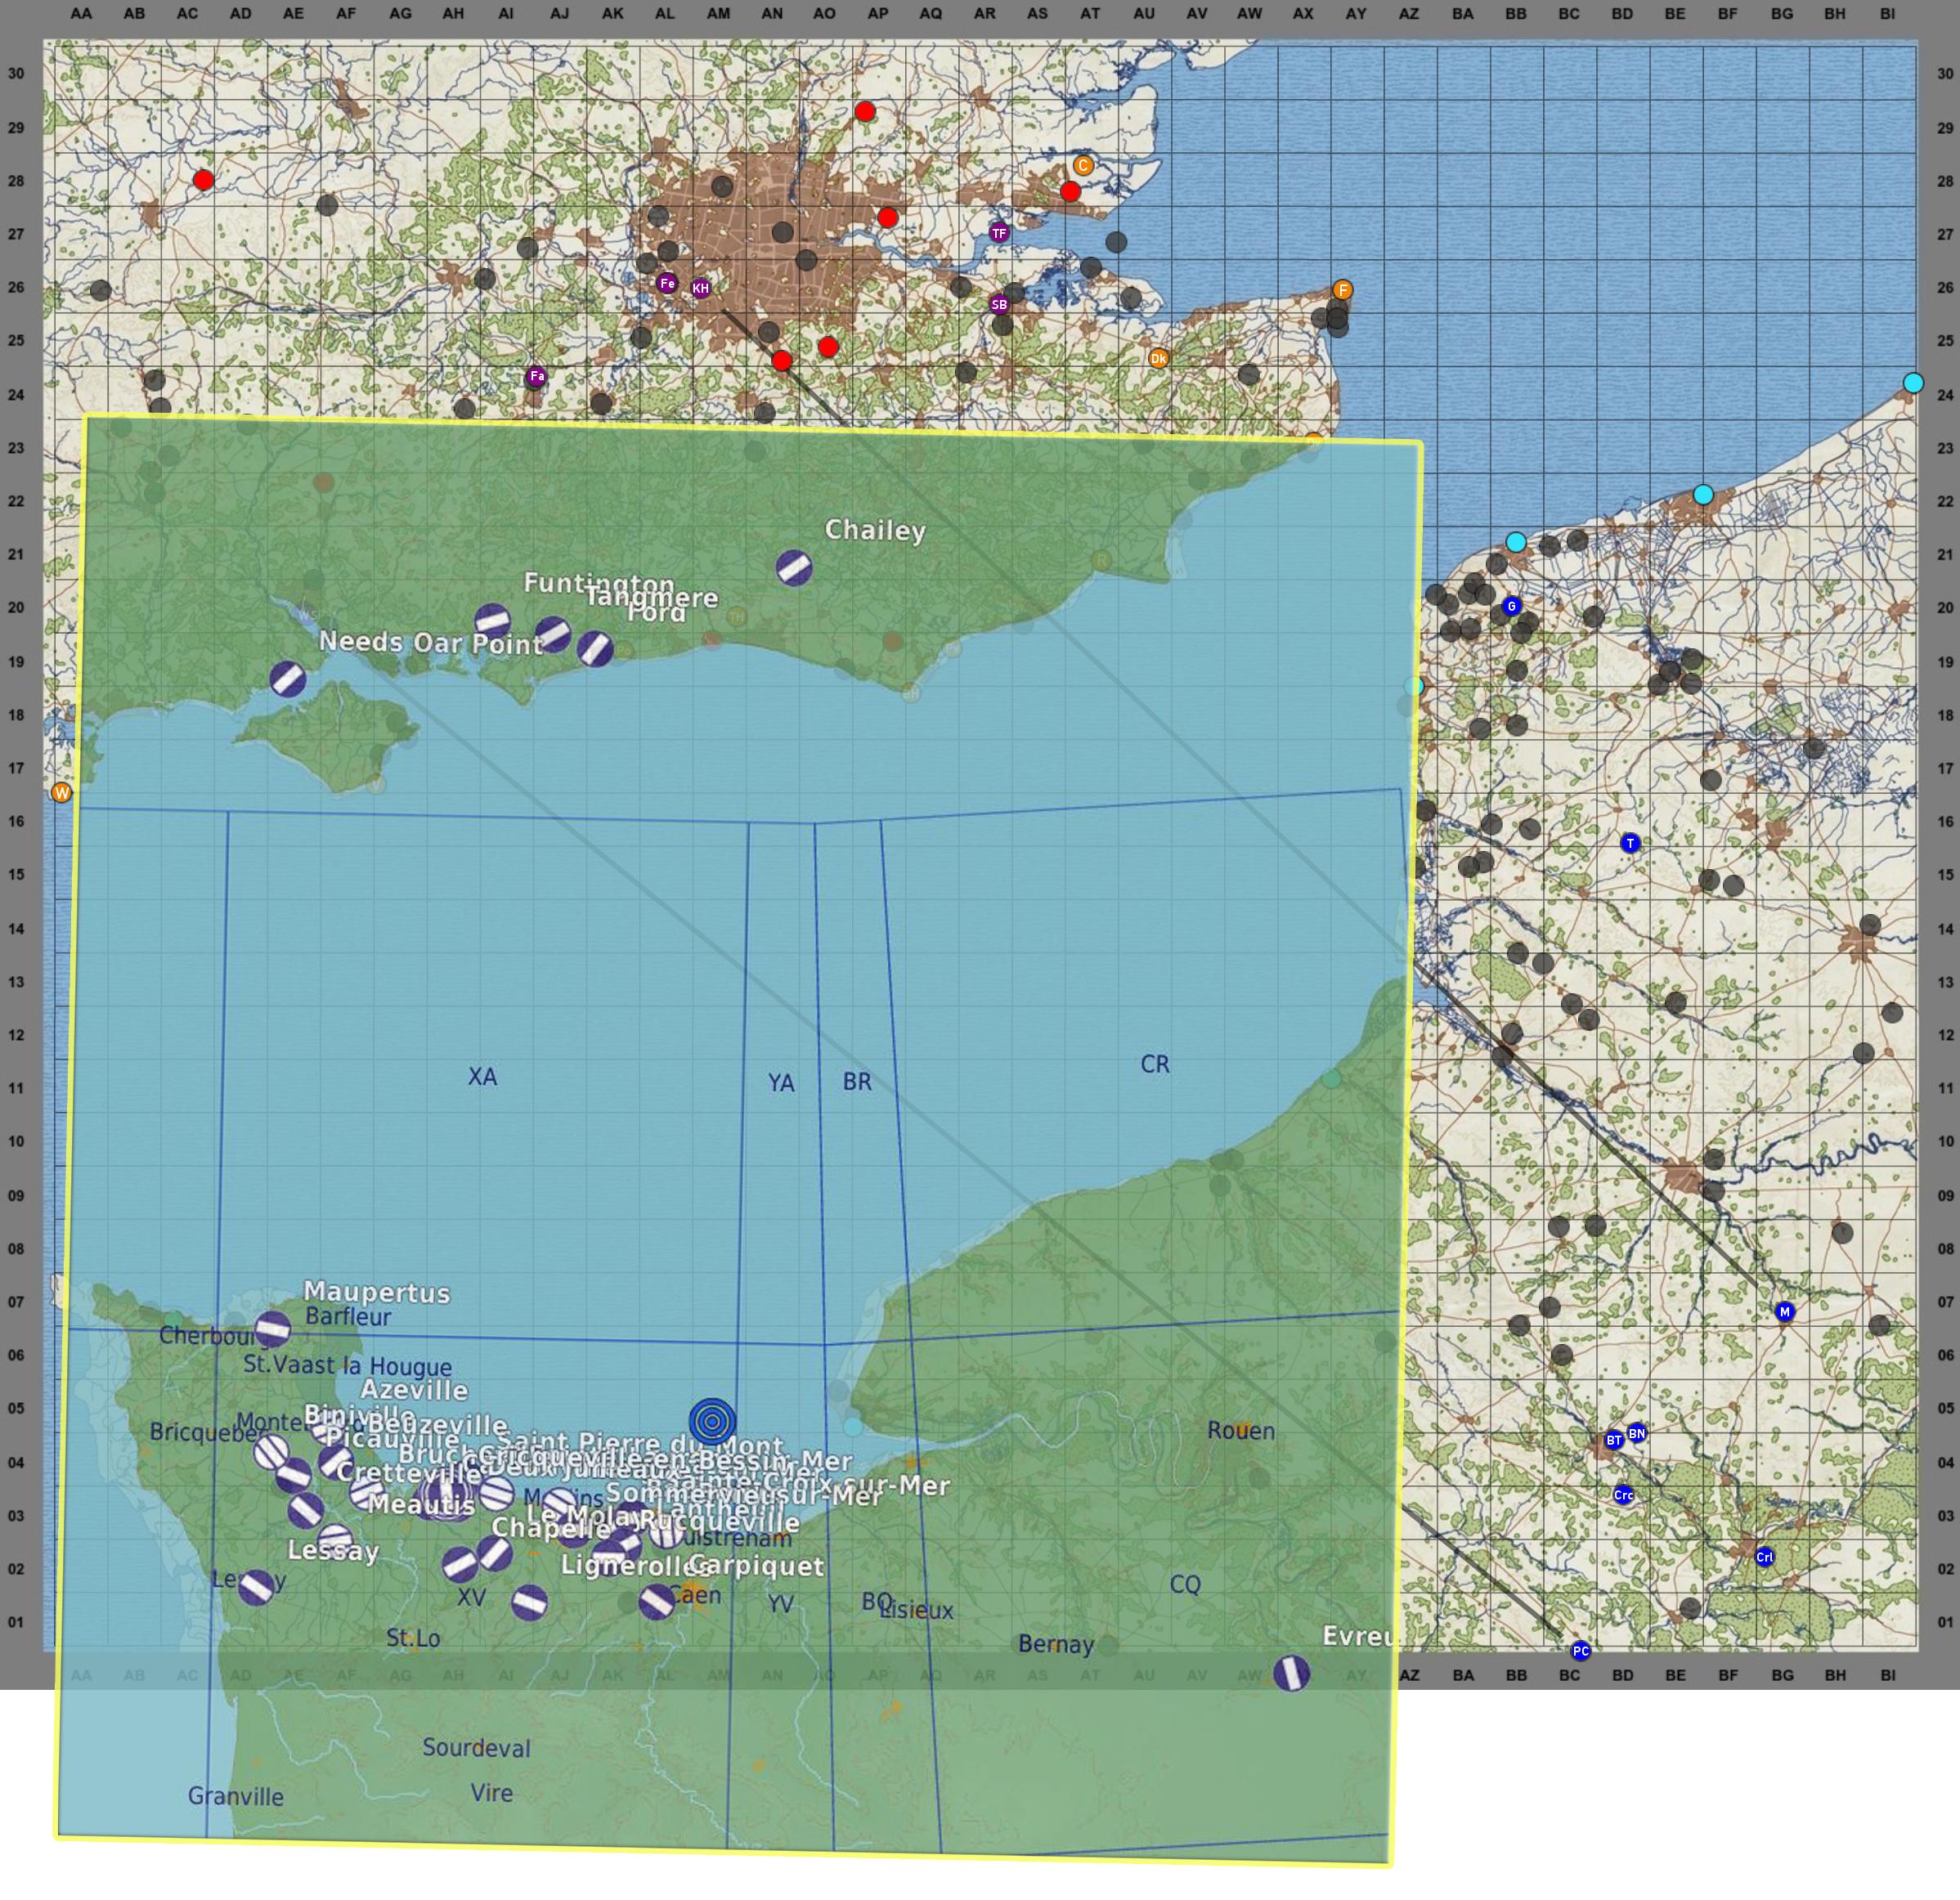 cod_dcs_map.jpg